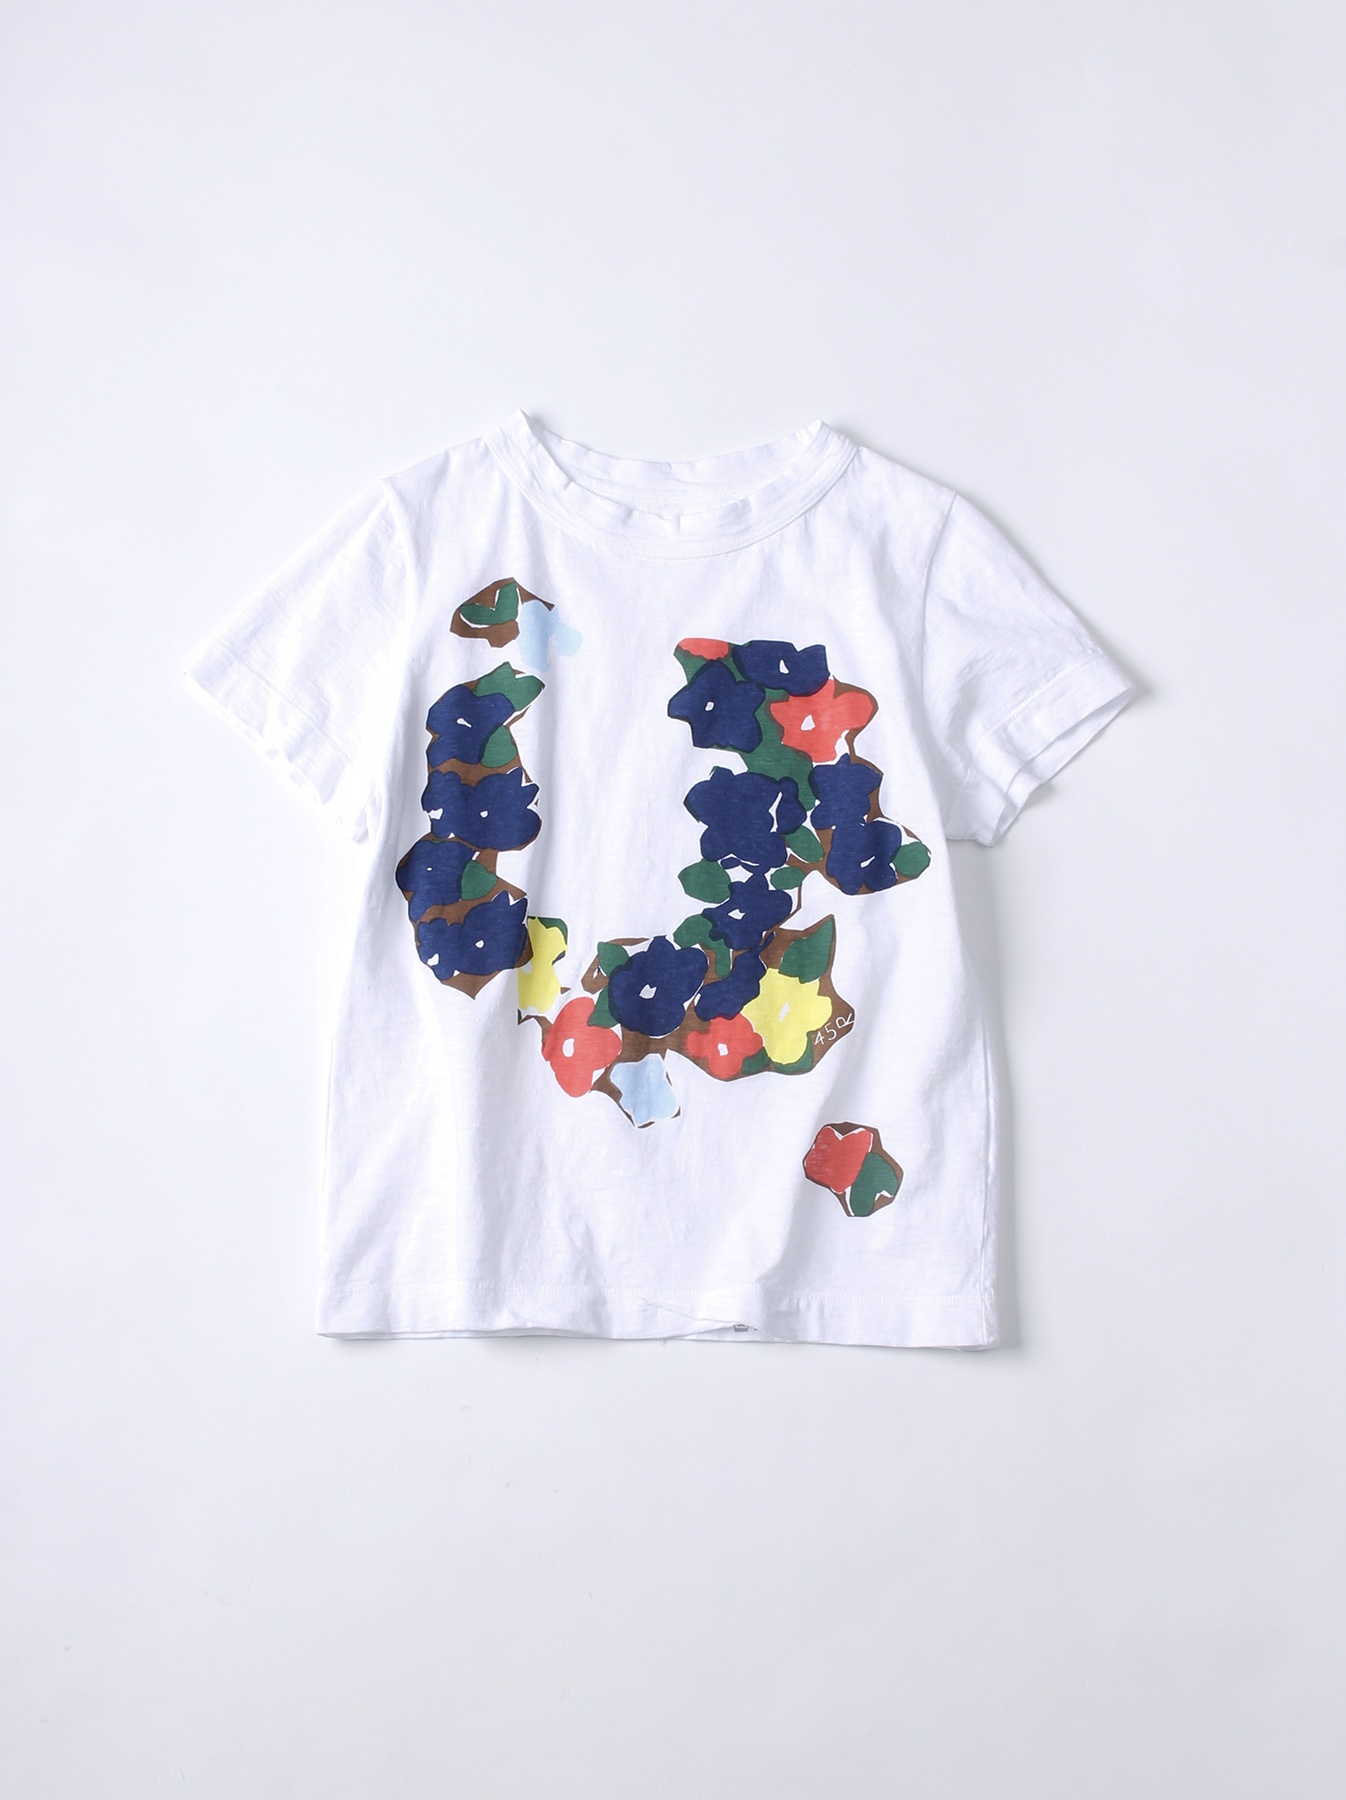 WH 45 Star T-shirt (Flower)-1